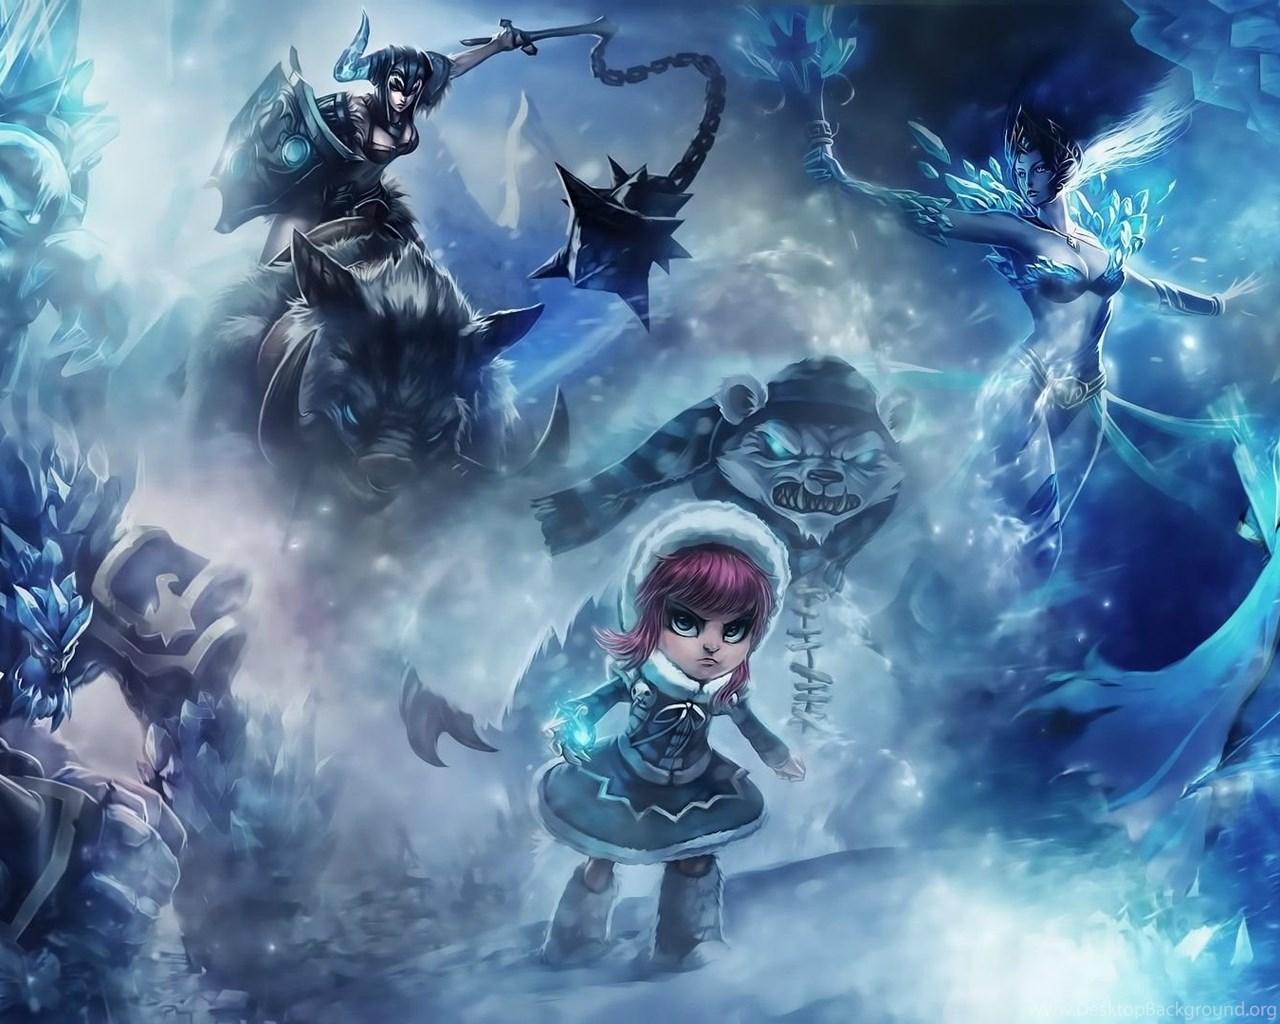 72 Ashe League Of Legends Hd Wallpapers Desktop Background